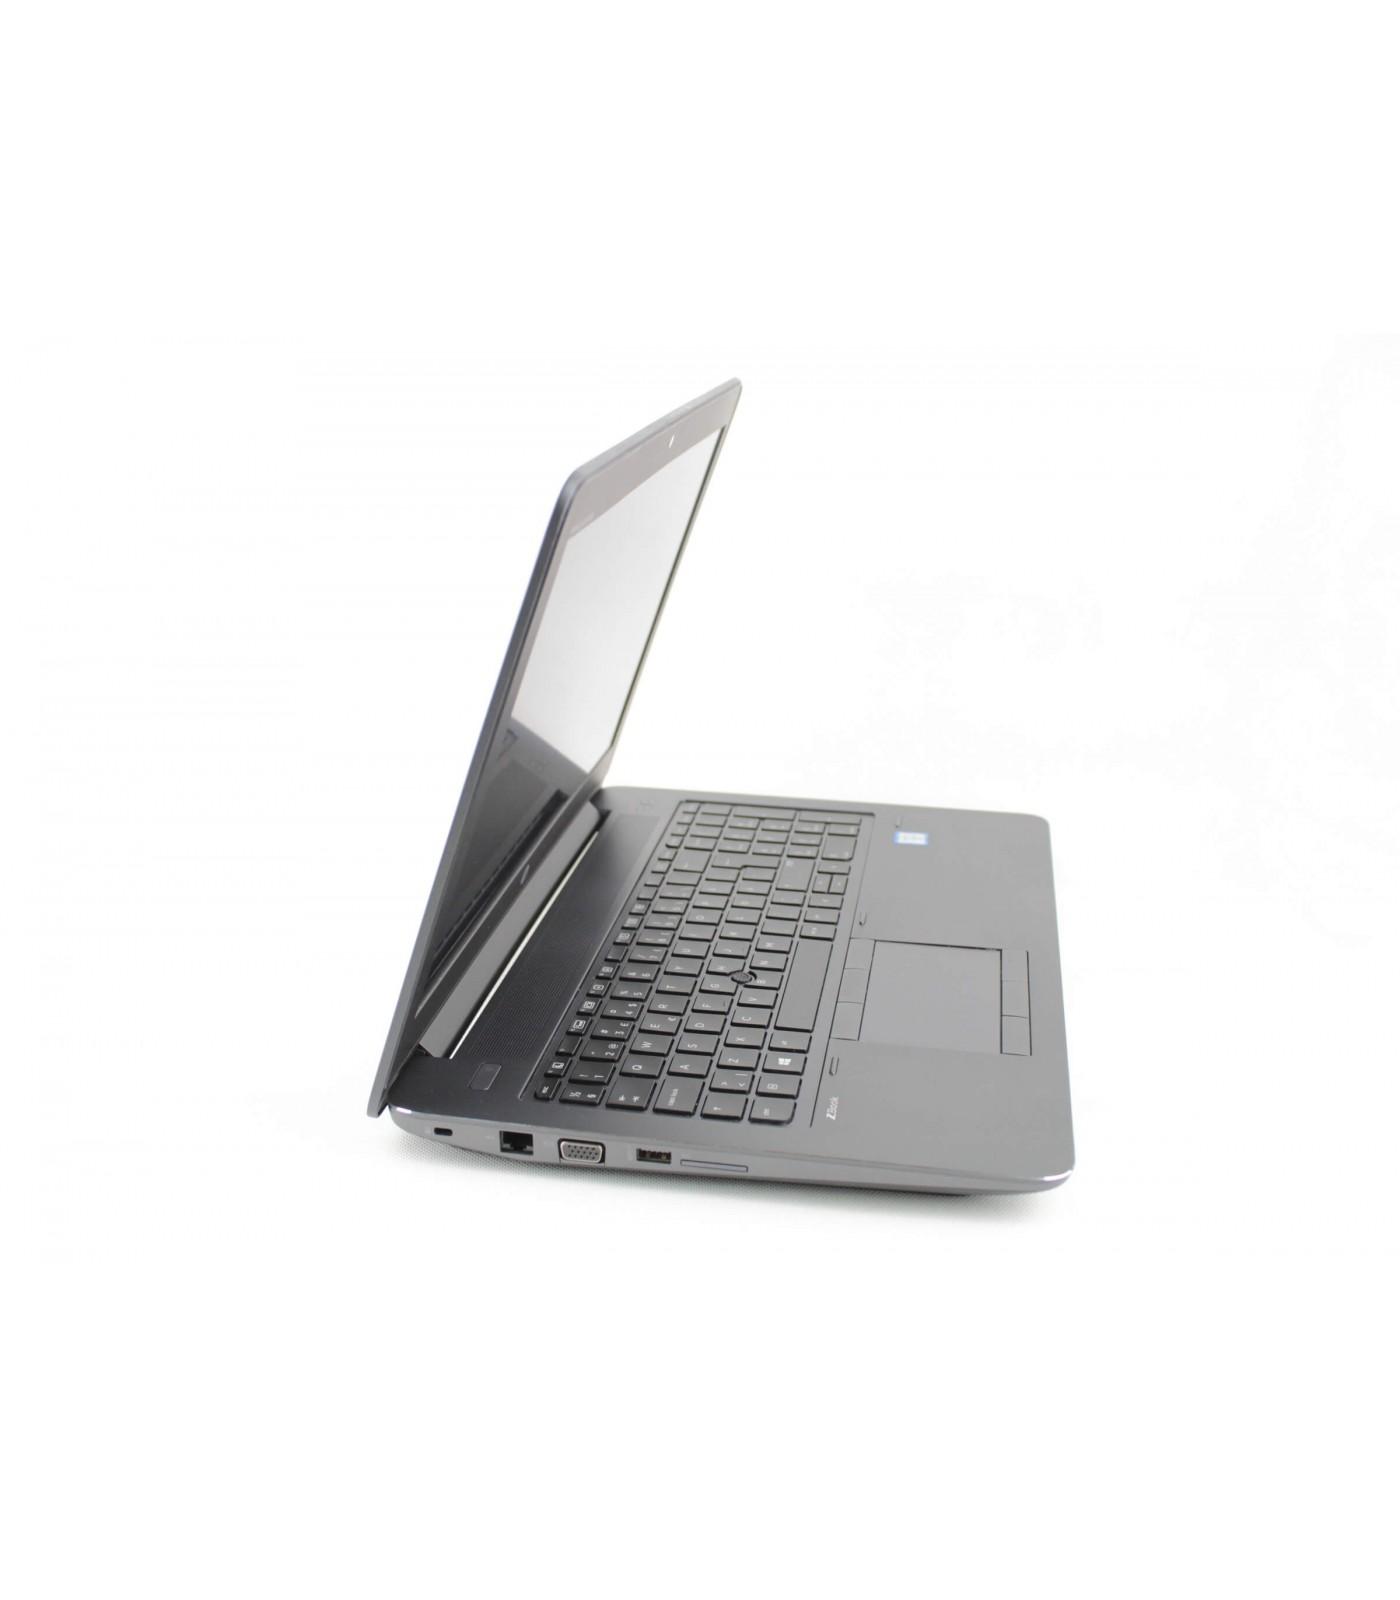 Poleasingowy laptop HP Zbook 15 G3 z Intel Core i7-6820HQ i kartą graficzną Nvidia Quadro M2000M, Klasa A-